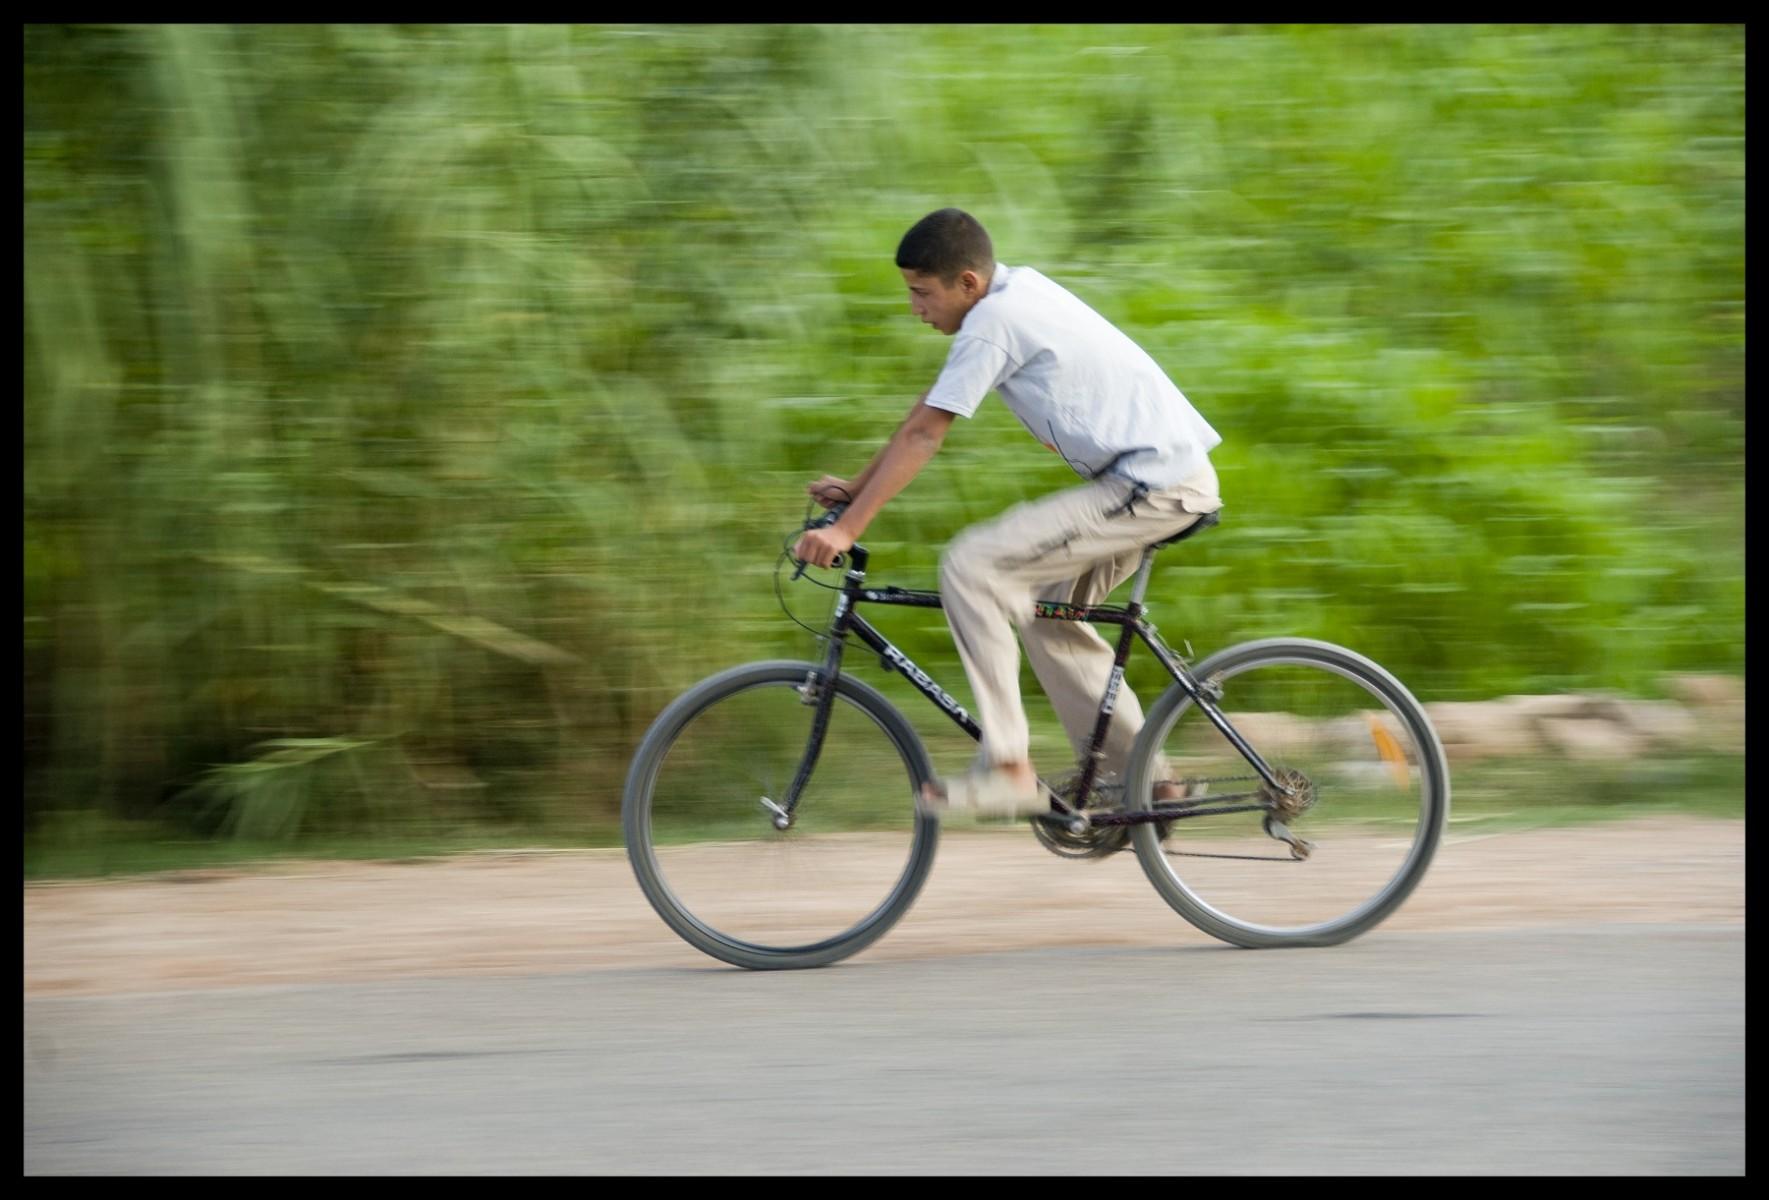 106318_DSC0055-biker Storie di Luce